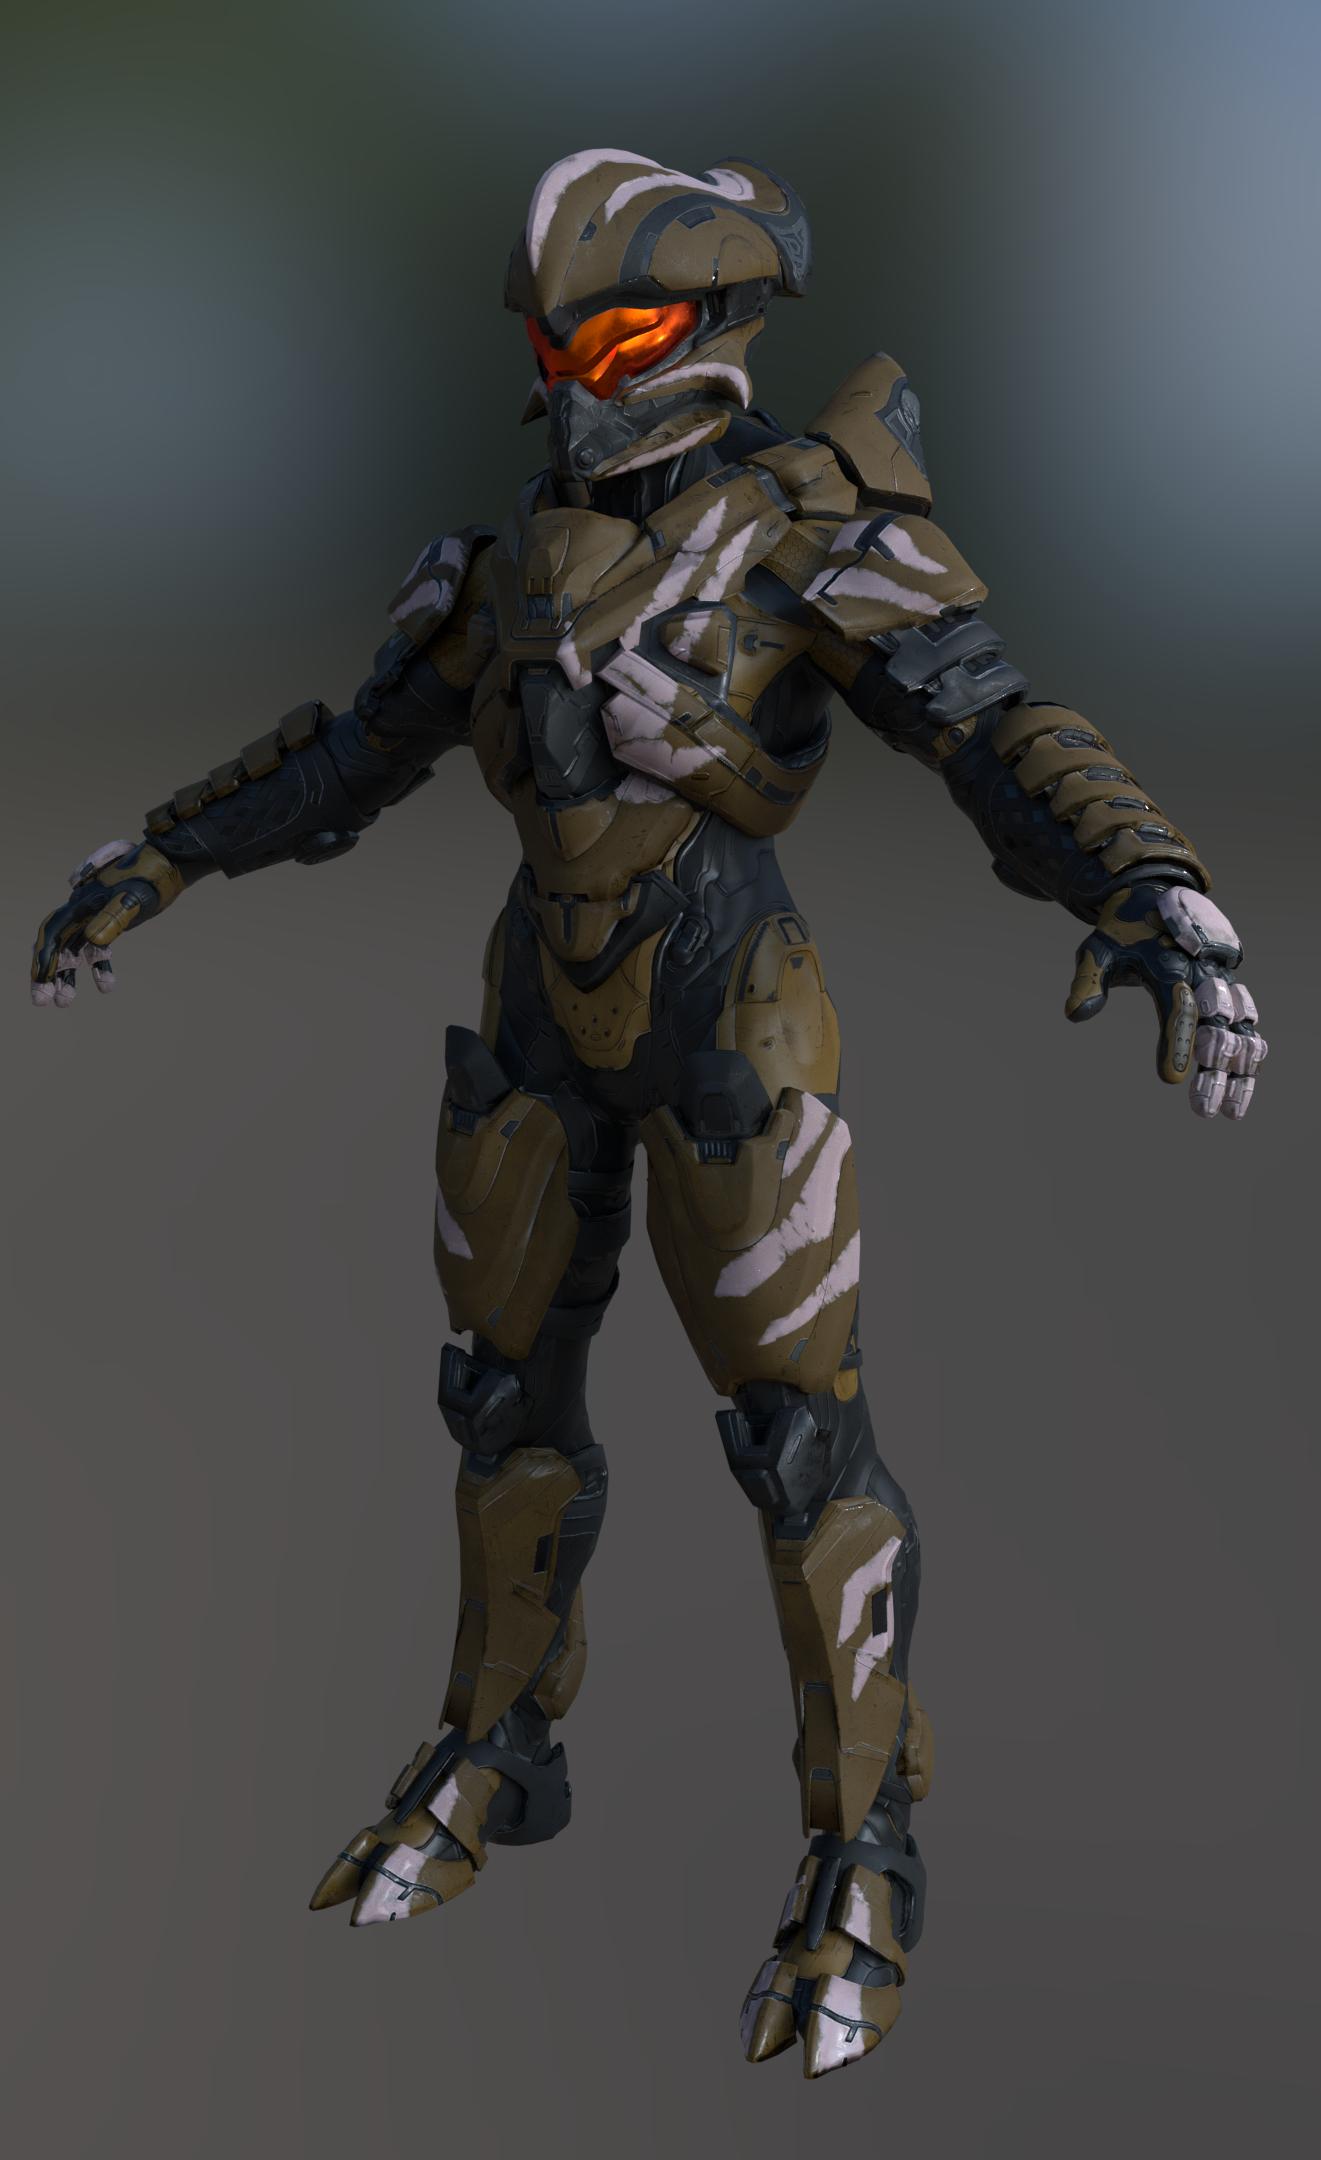 Mjolnir Armor Helioskill Halo 5 By Akiname On Deviantart